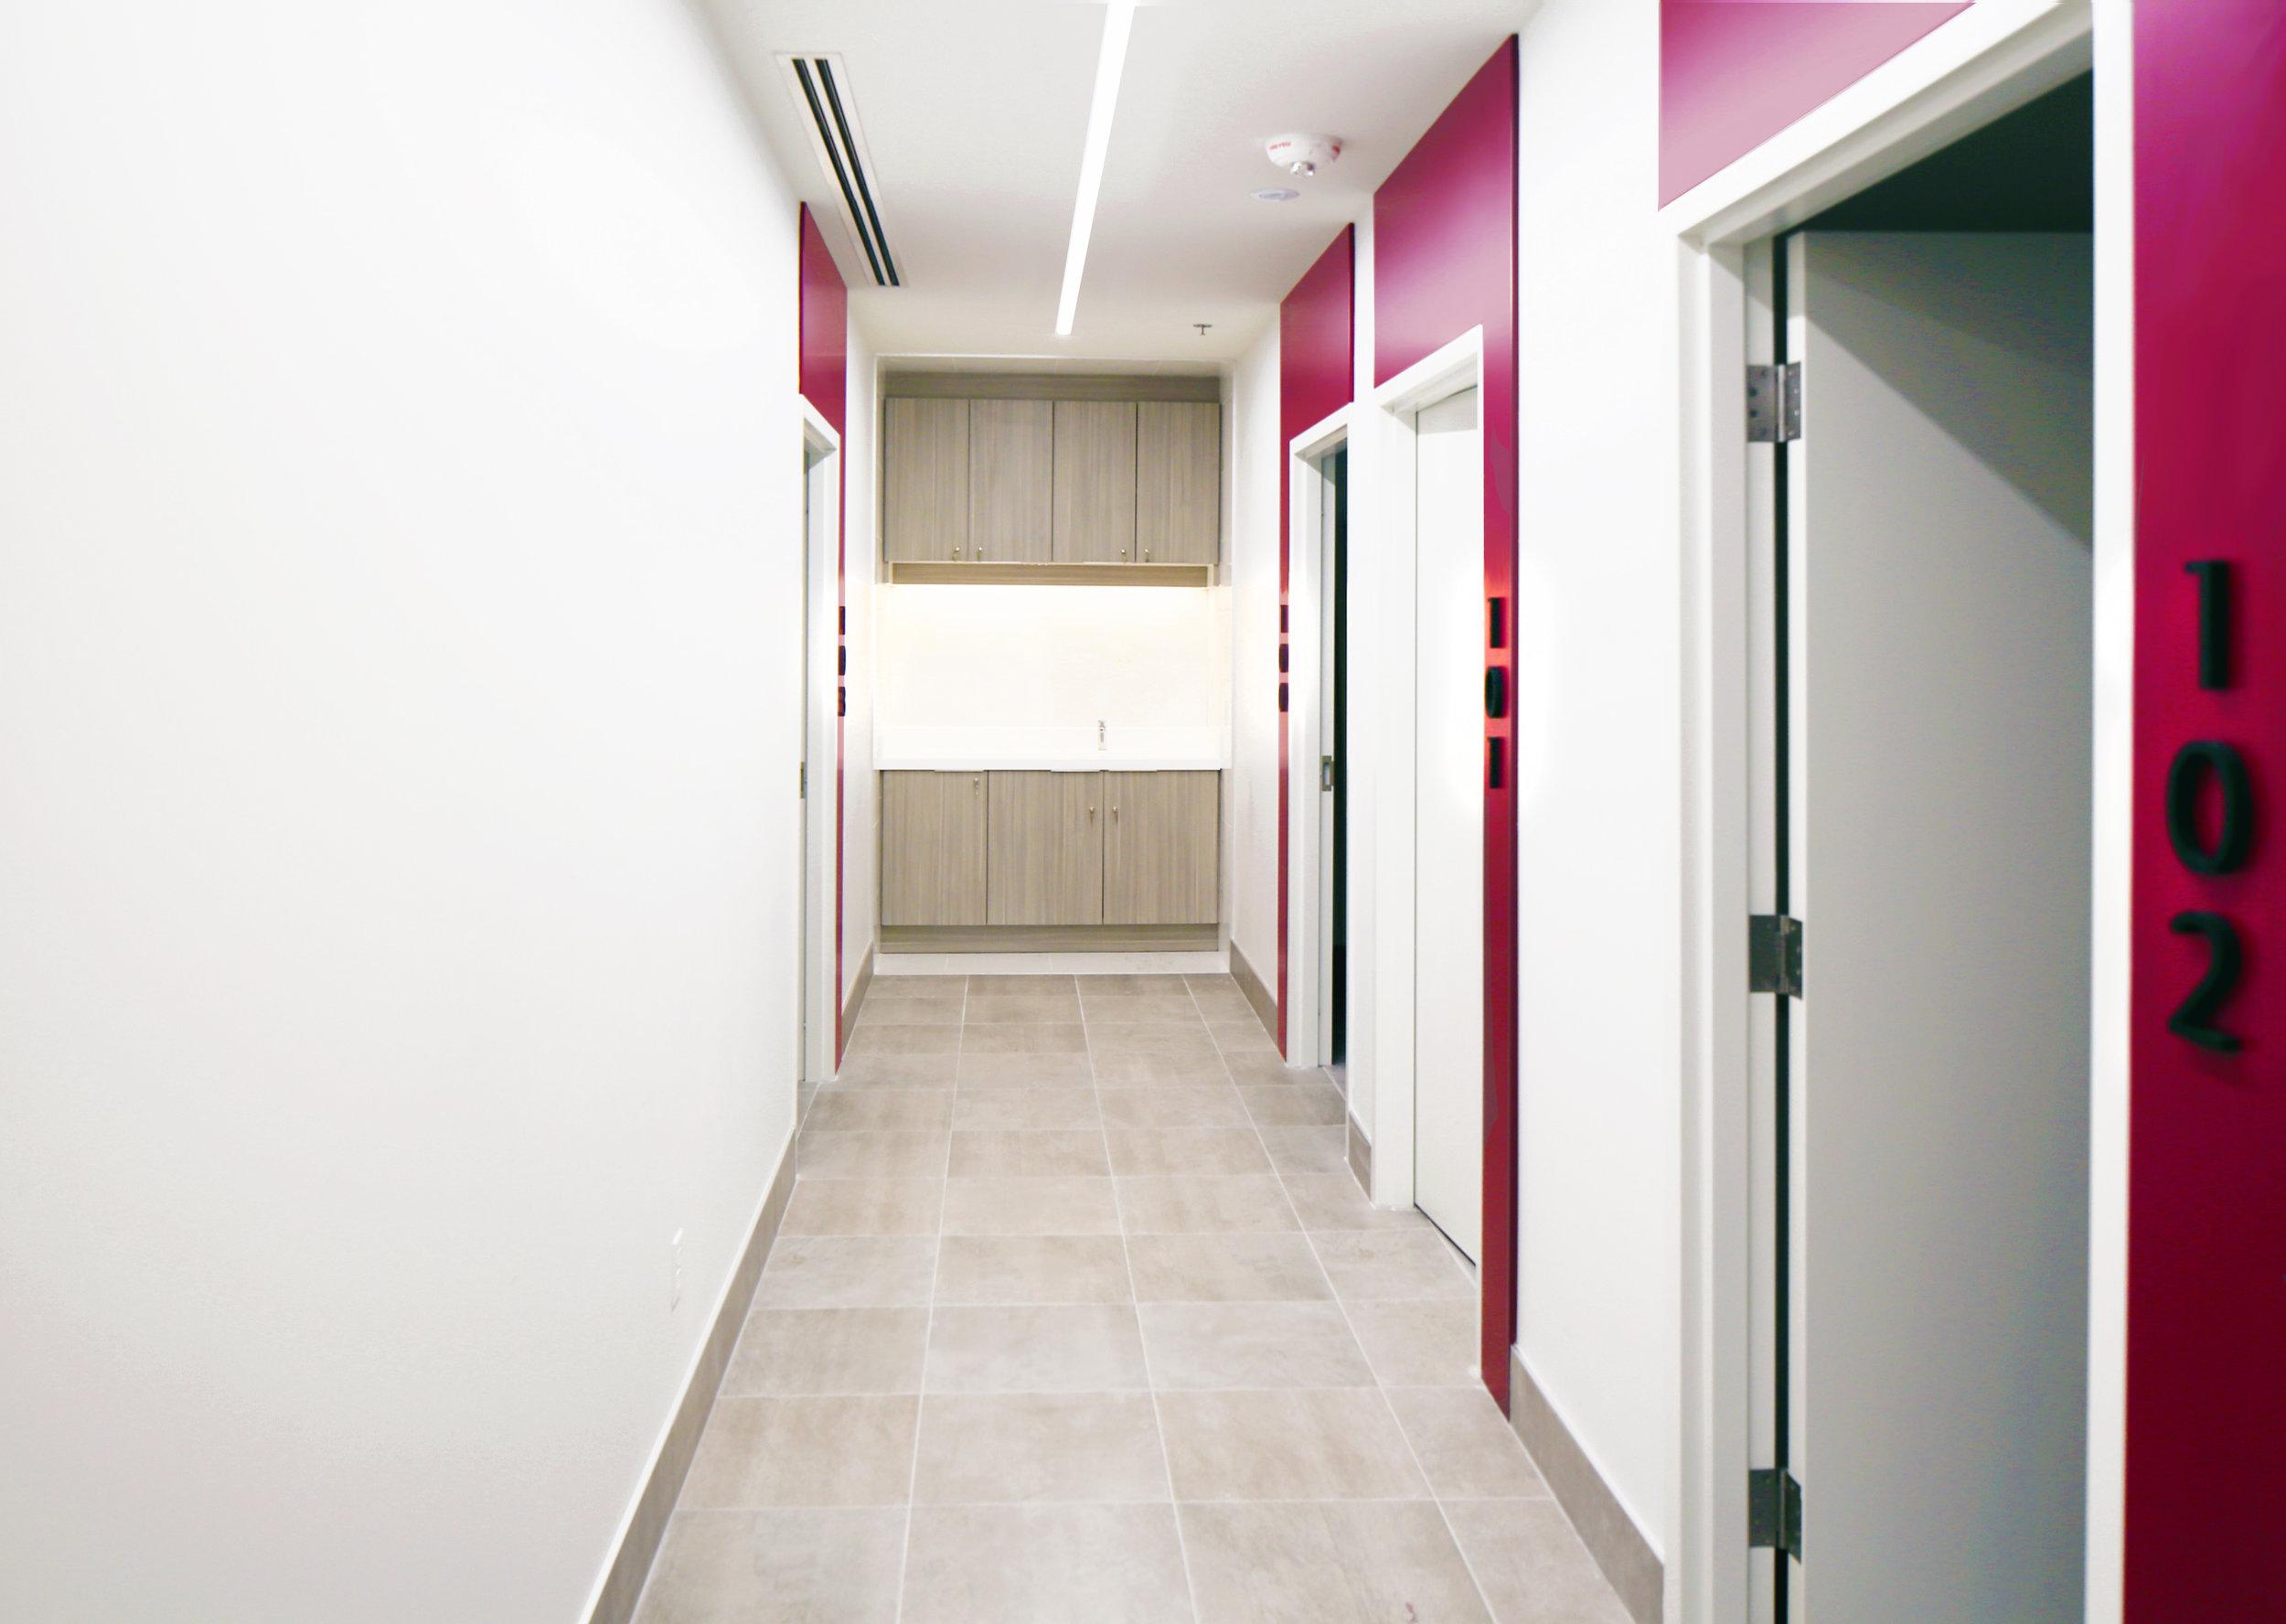 Canada_Toronto_Healthcare_Cardiology_Design_architect_nurse-station.jpg